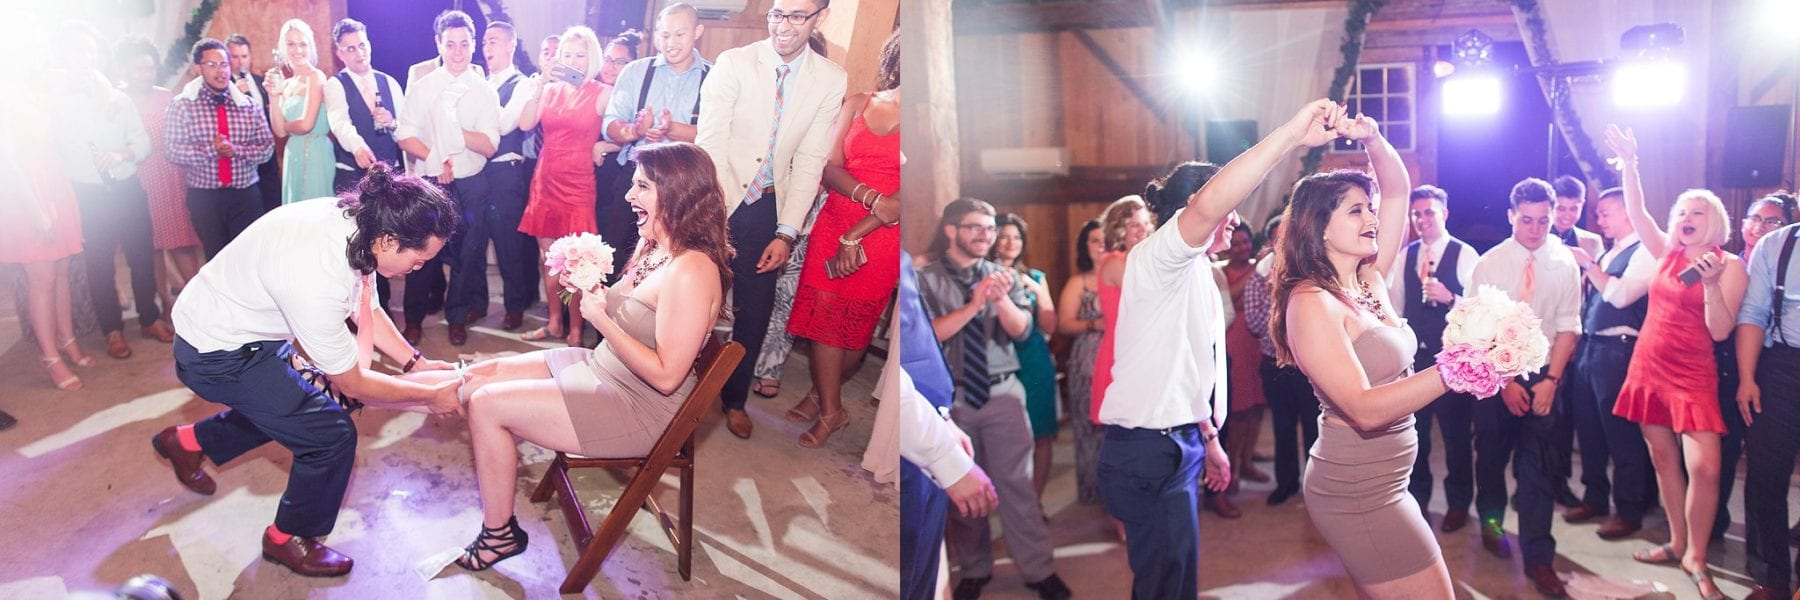 Justin & Megan Big Spring Farm Wedding Photos-565.jpg